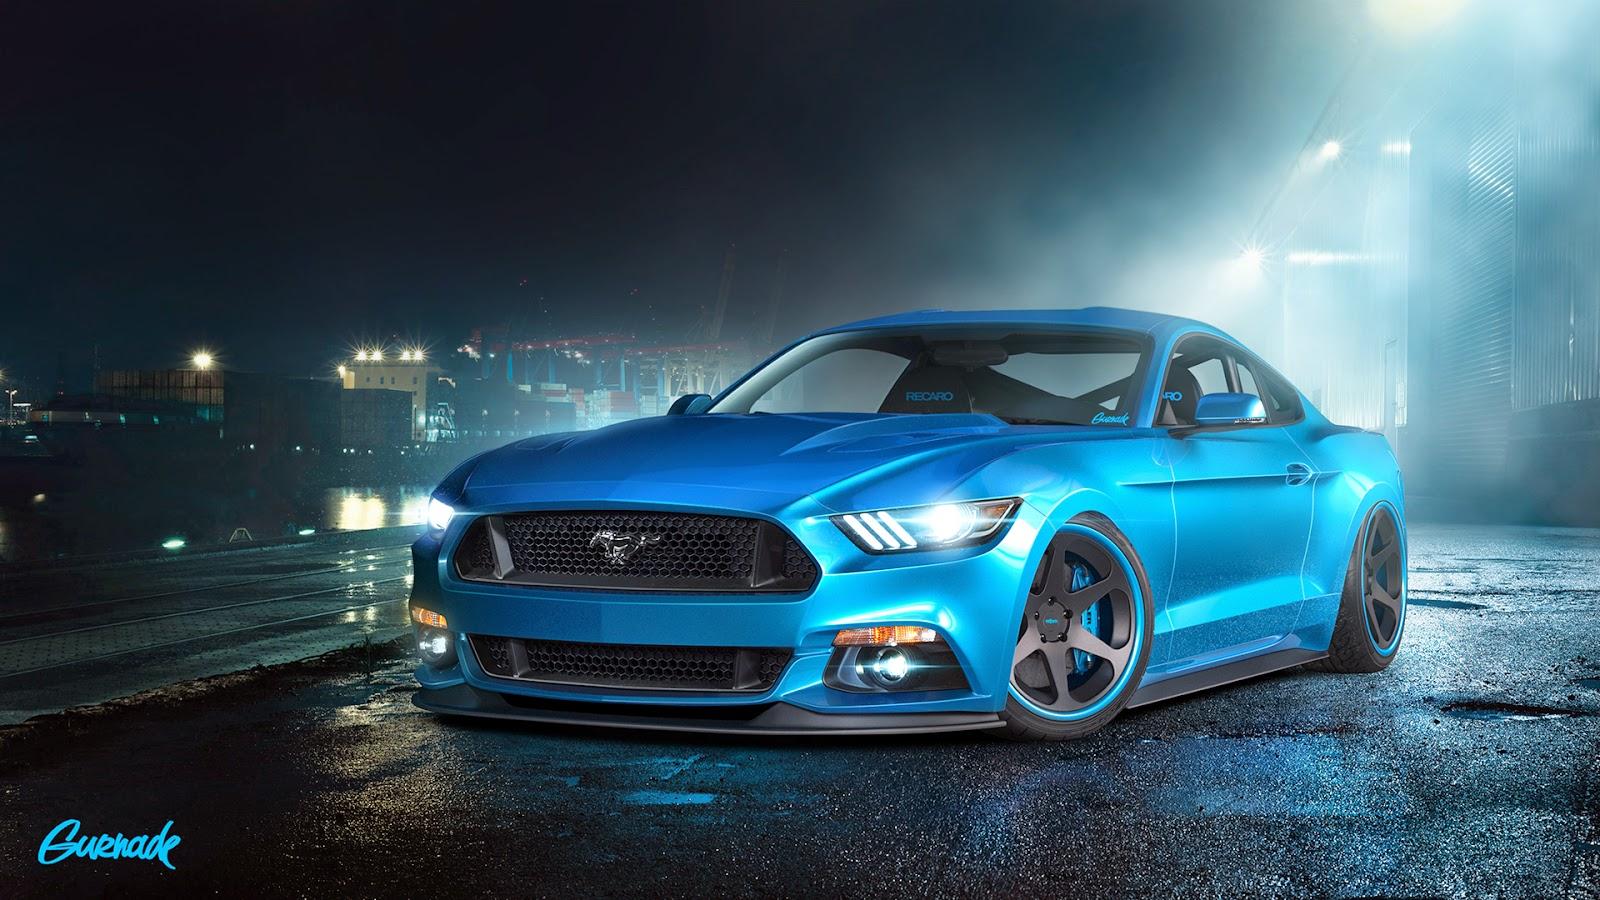 Mustang gt speed dating